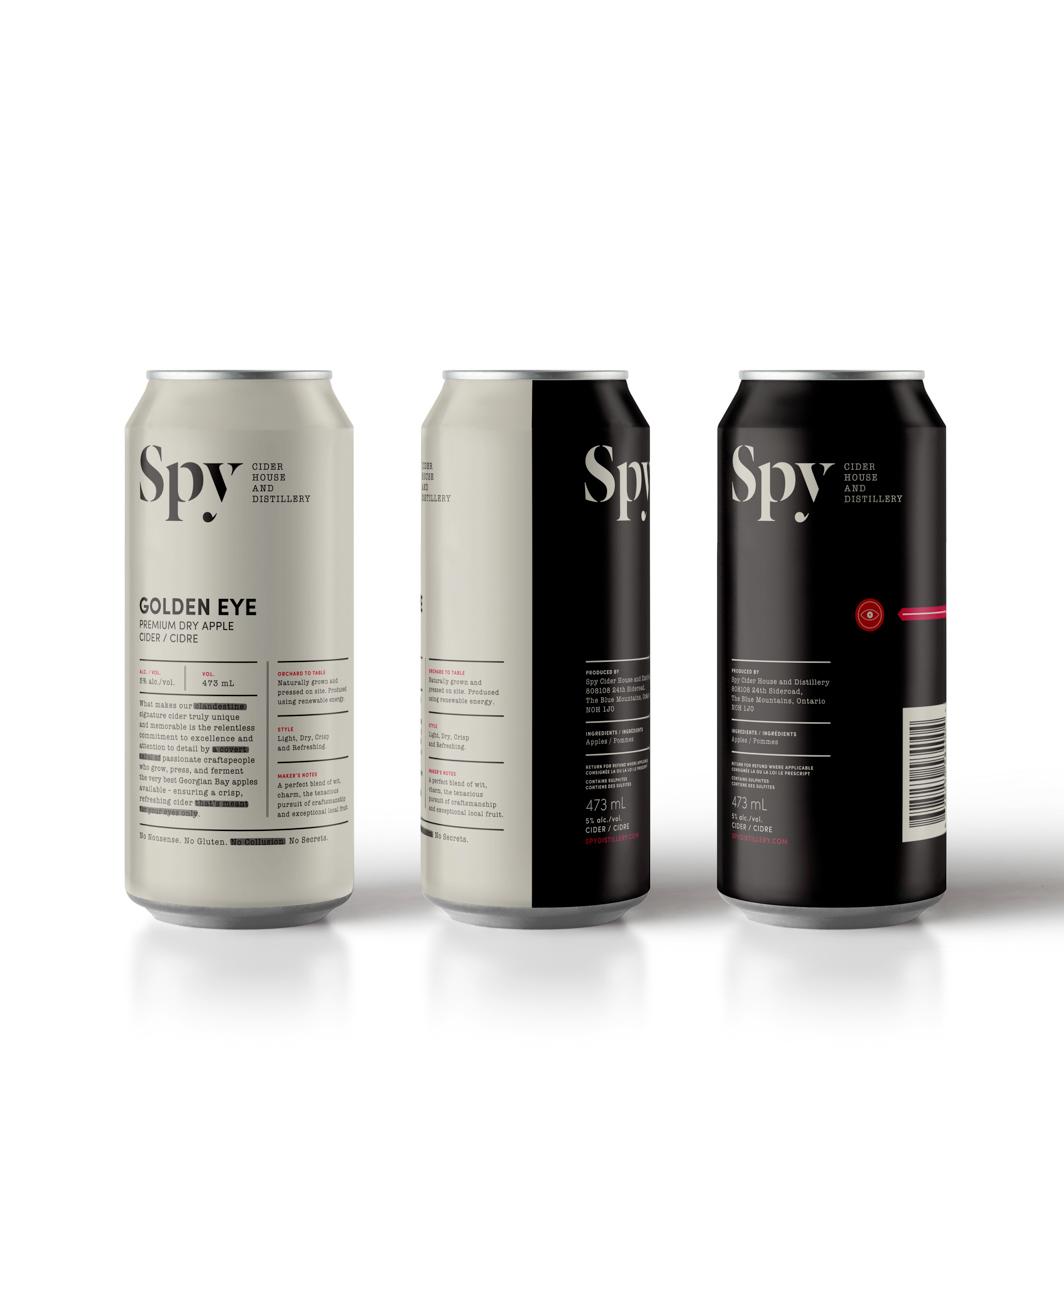 Spy Cider House and Distillery TDC ECV